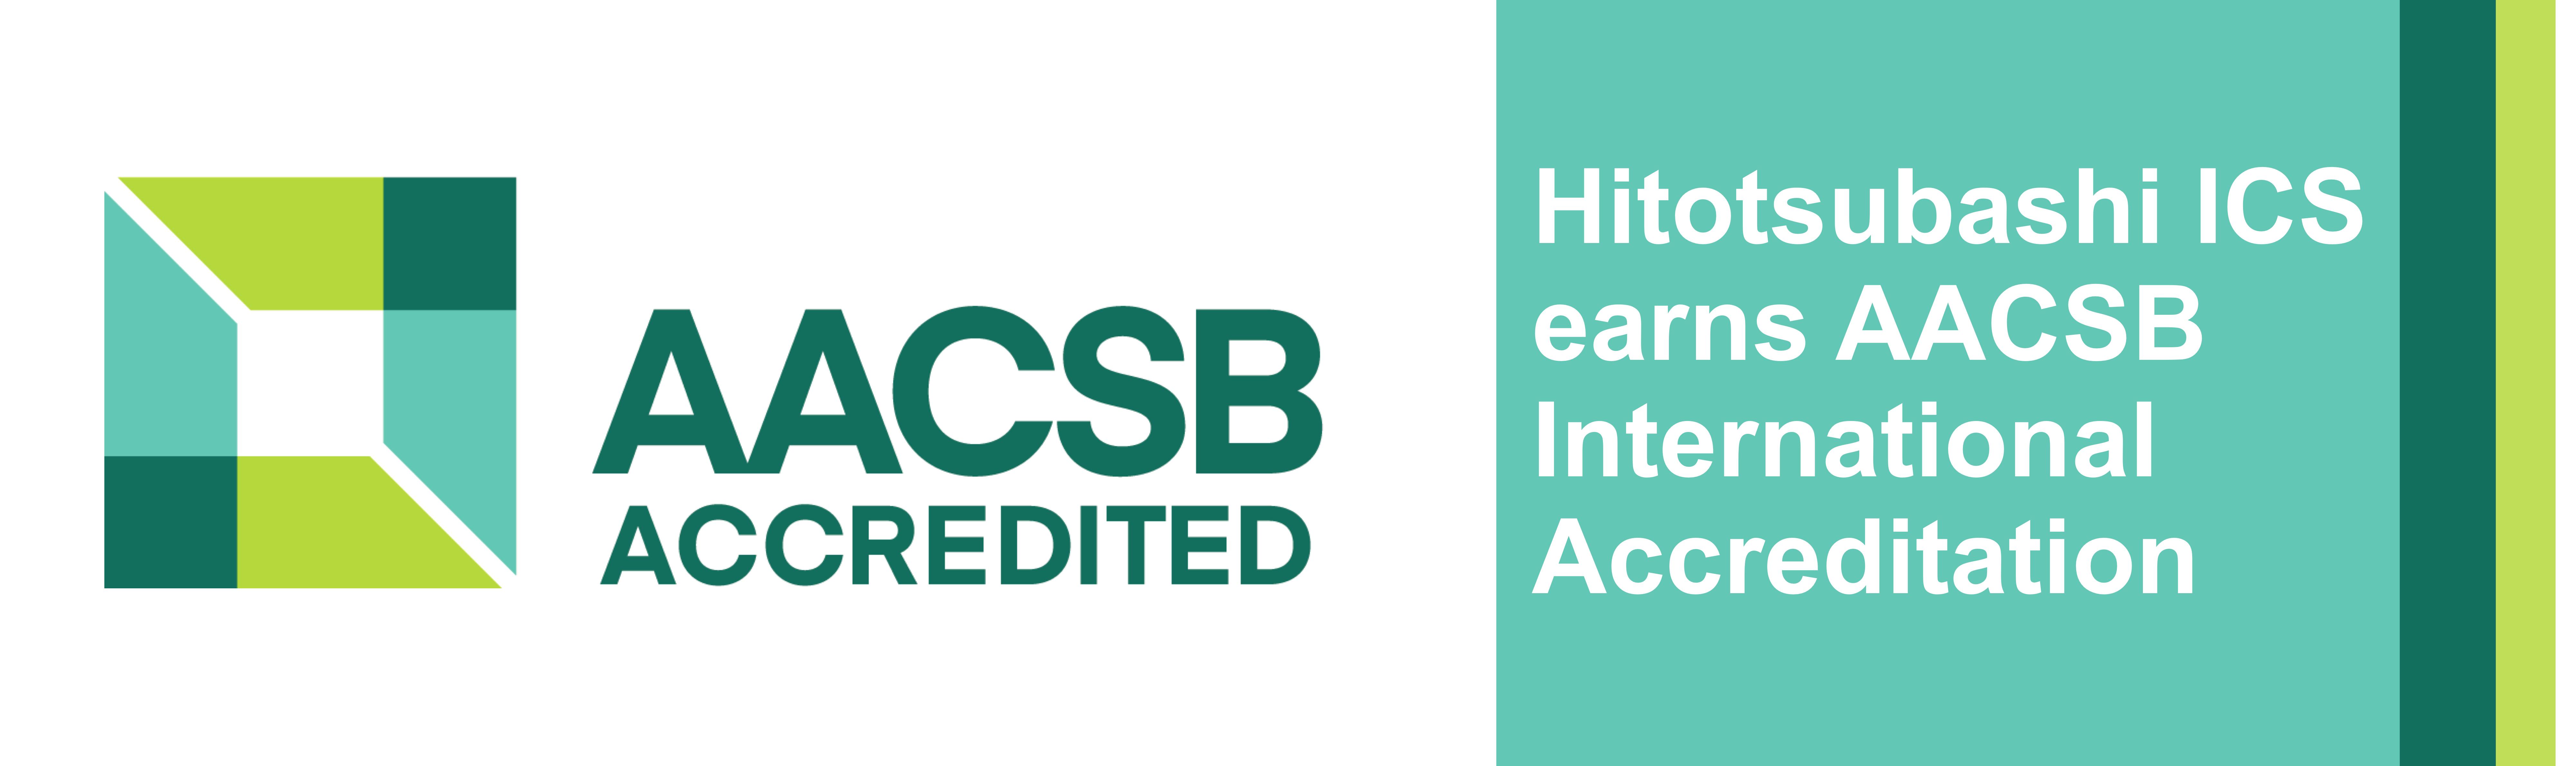 Hitotsubashi ICS AACSB Accredited